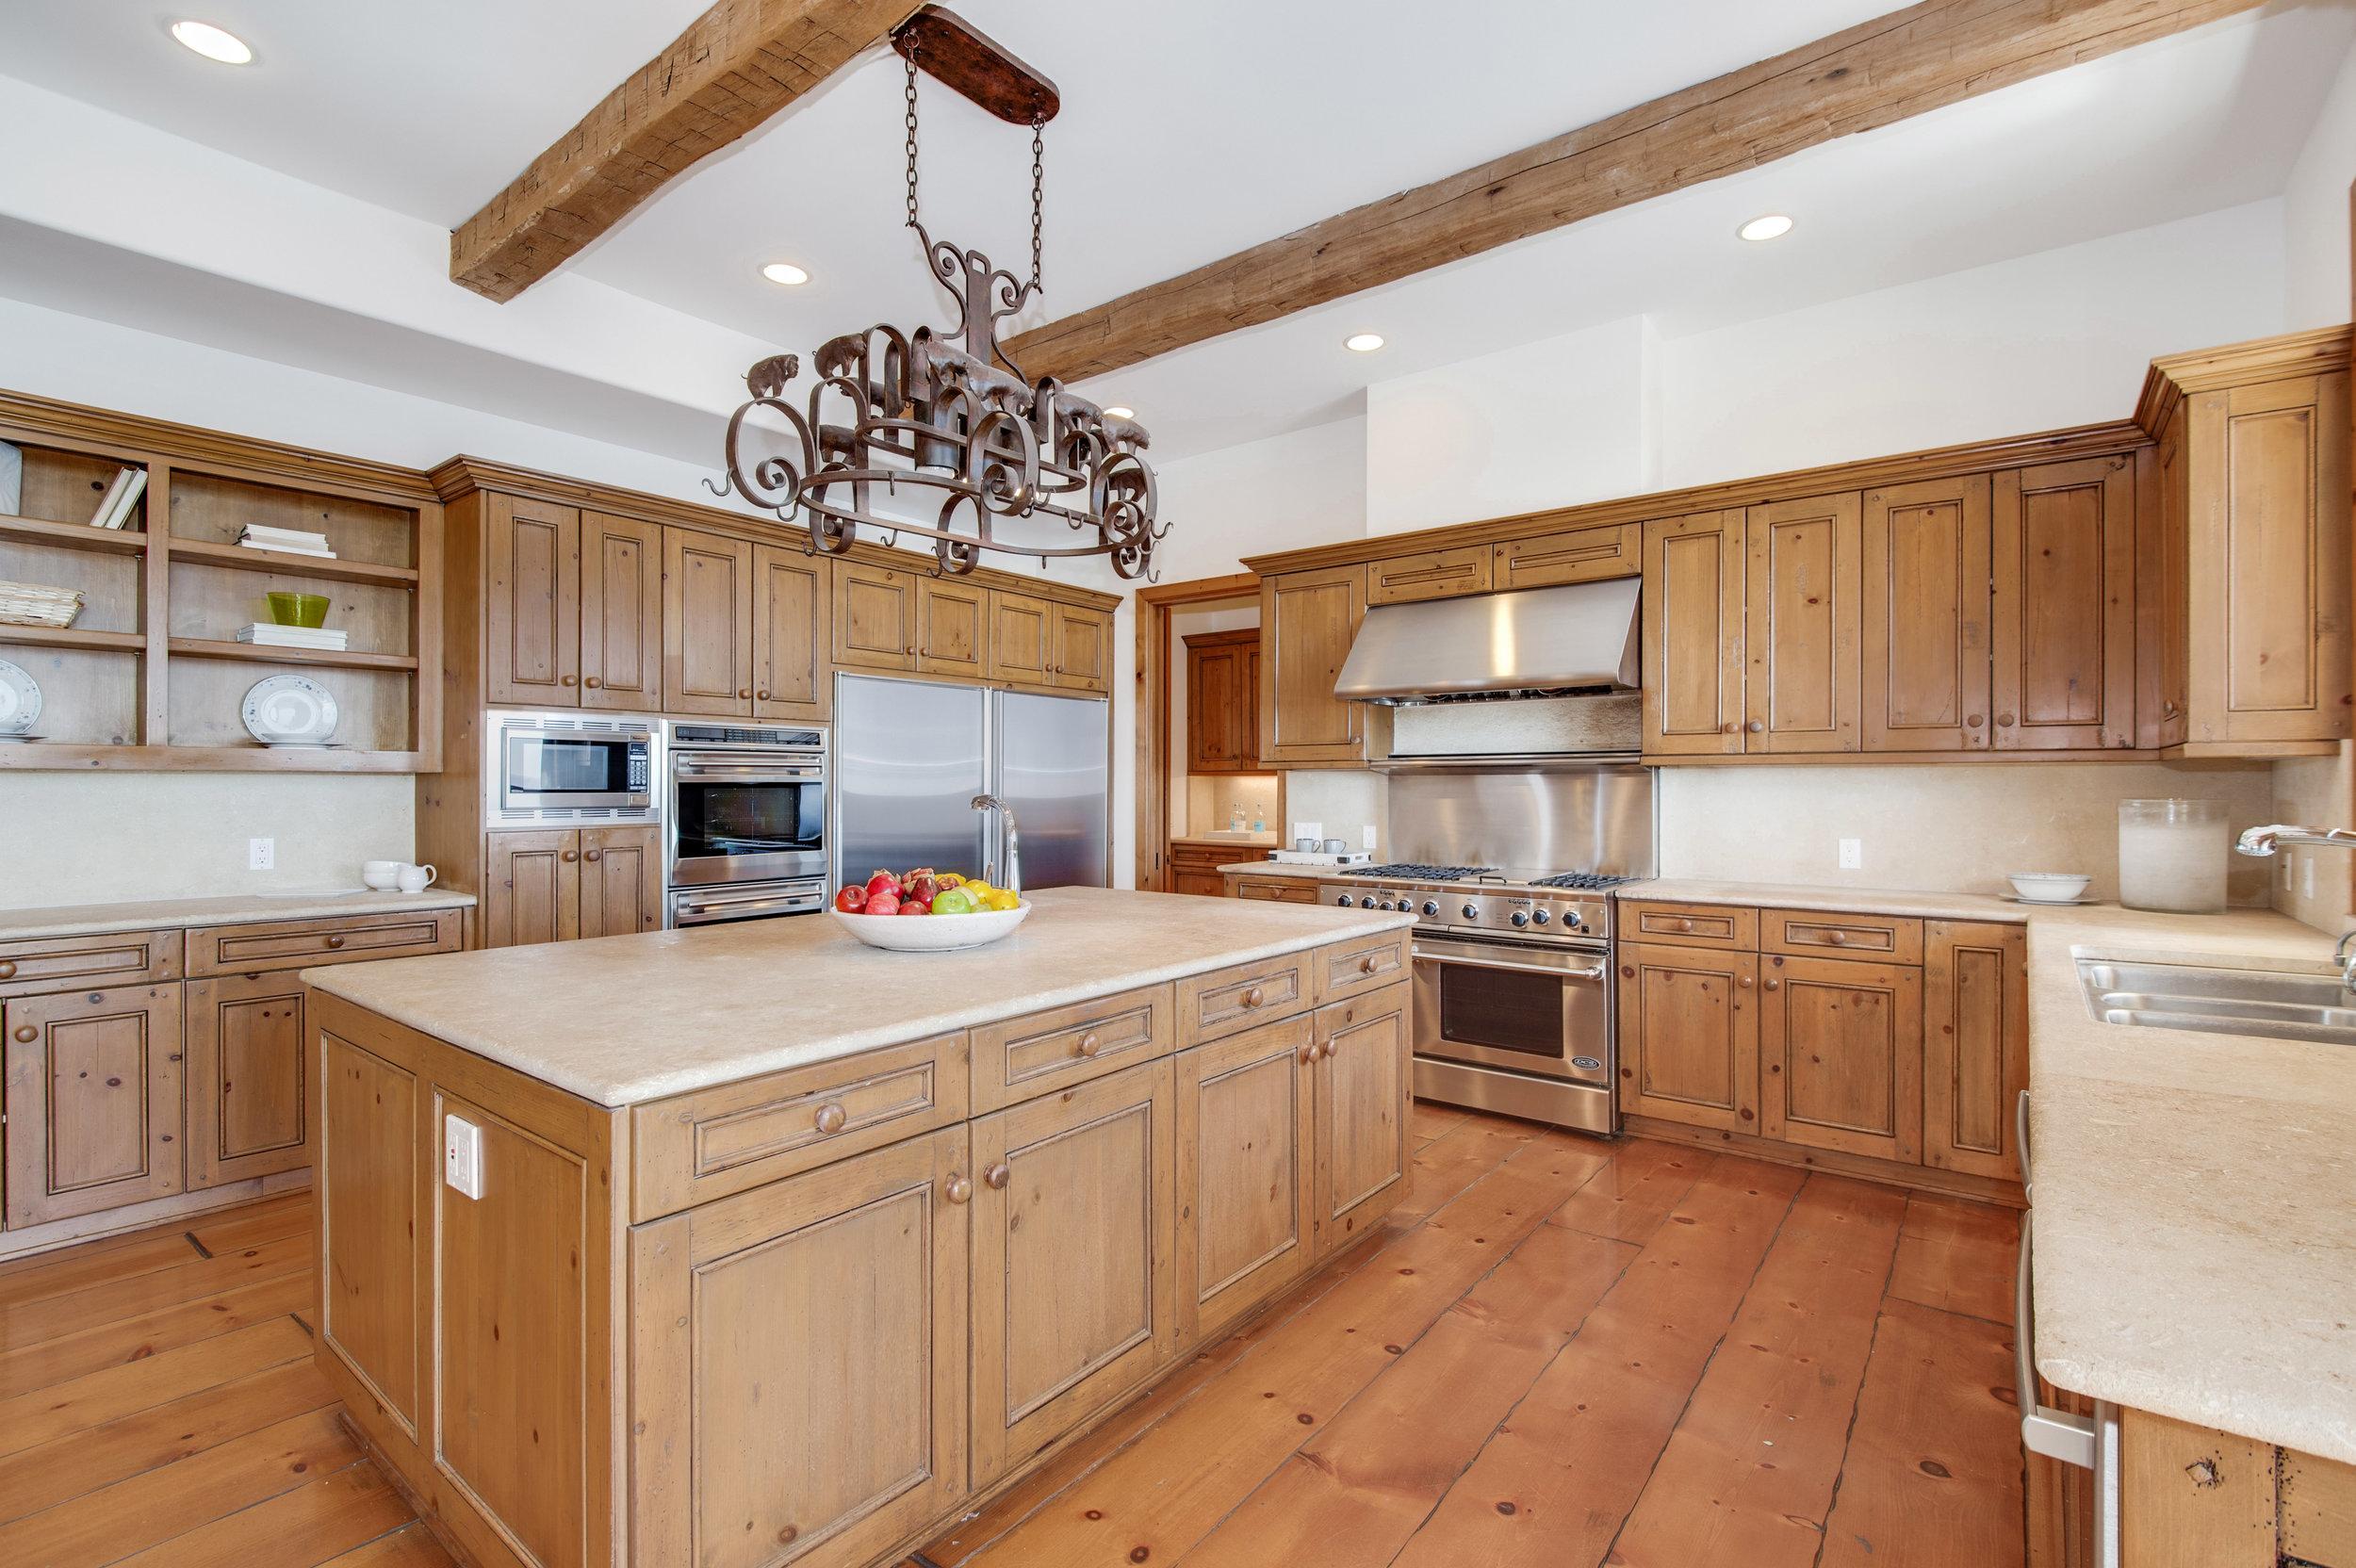 007 Kitchen 27475 Latigo Bay View Drive For Sale Lease The Malibu Life Team Luxury Real Estate.jpg